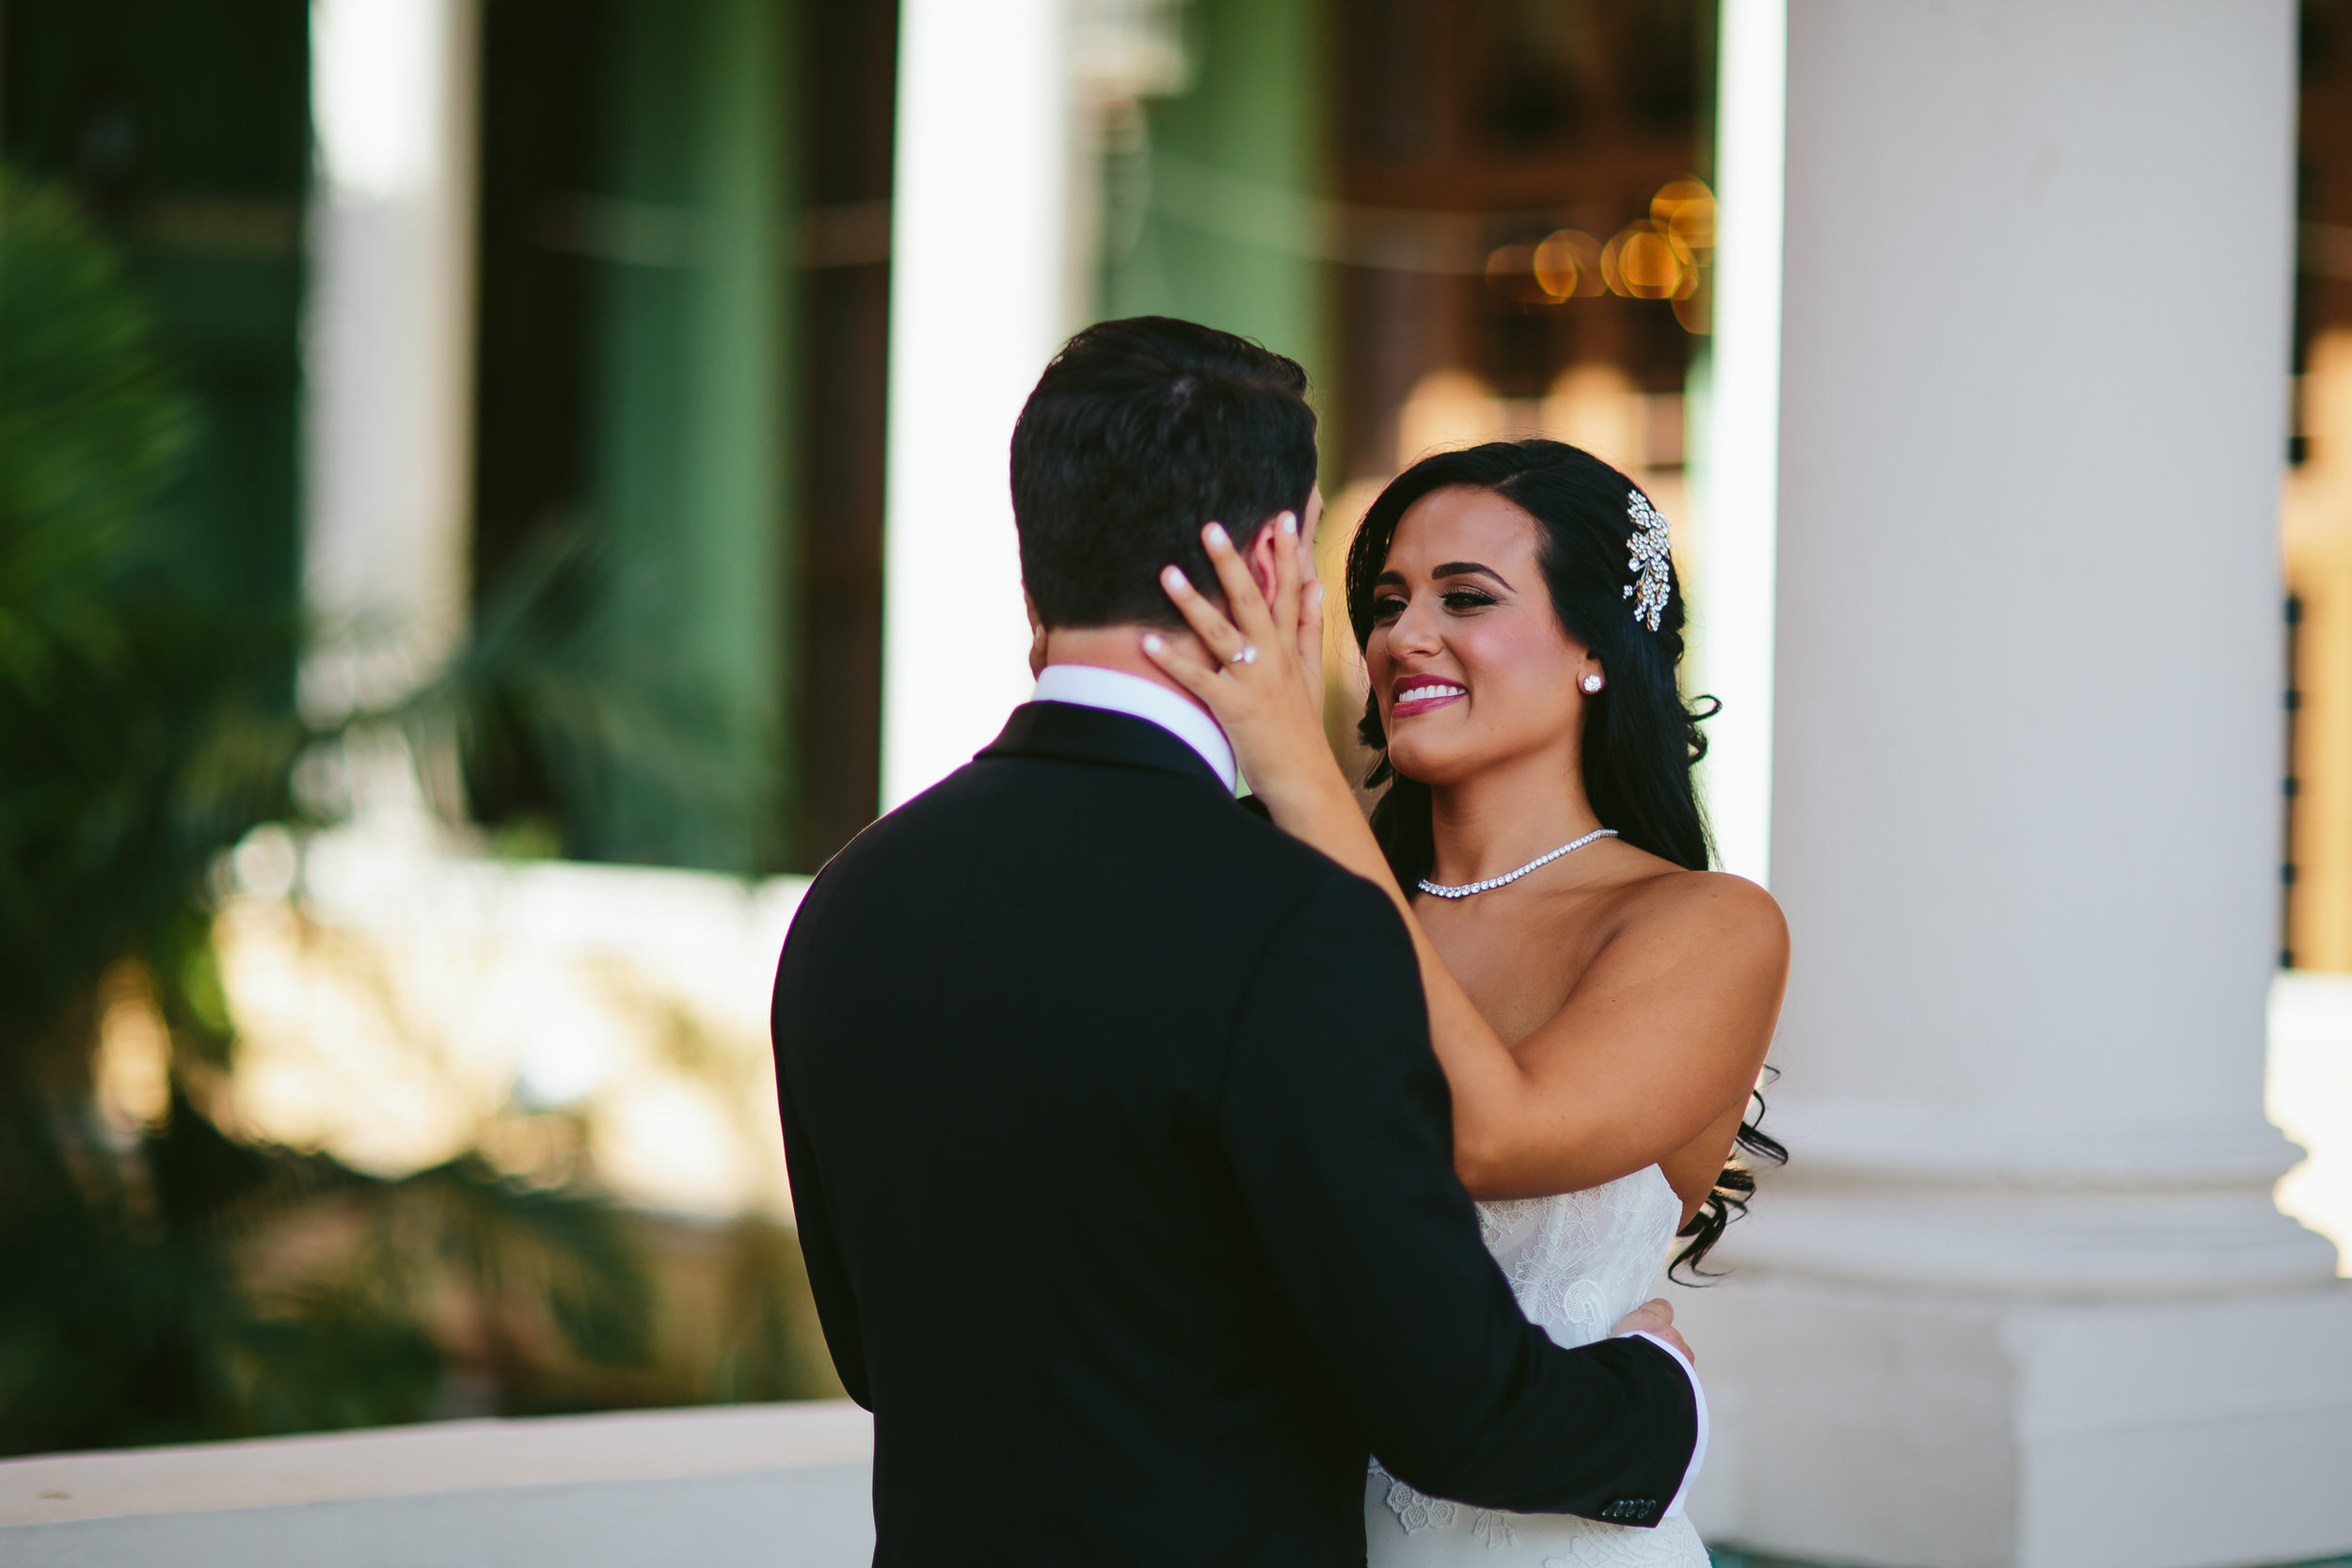 biltmore-wedding-steph-lynn-photo-photographer-bride-and-groom-14.jpg